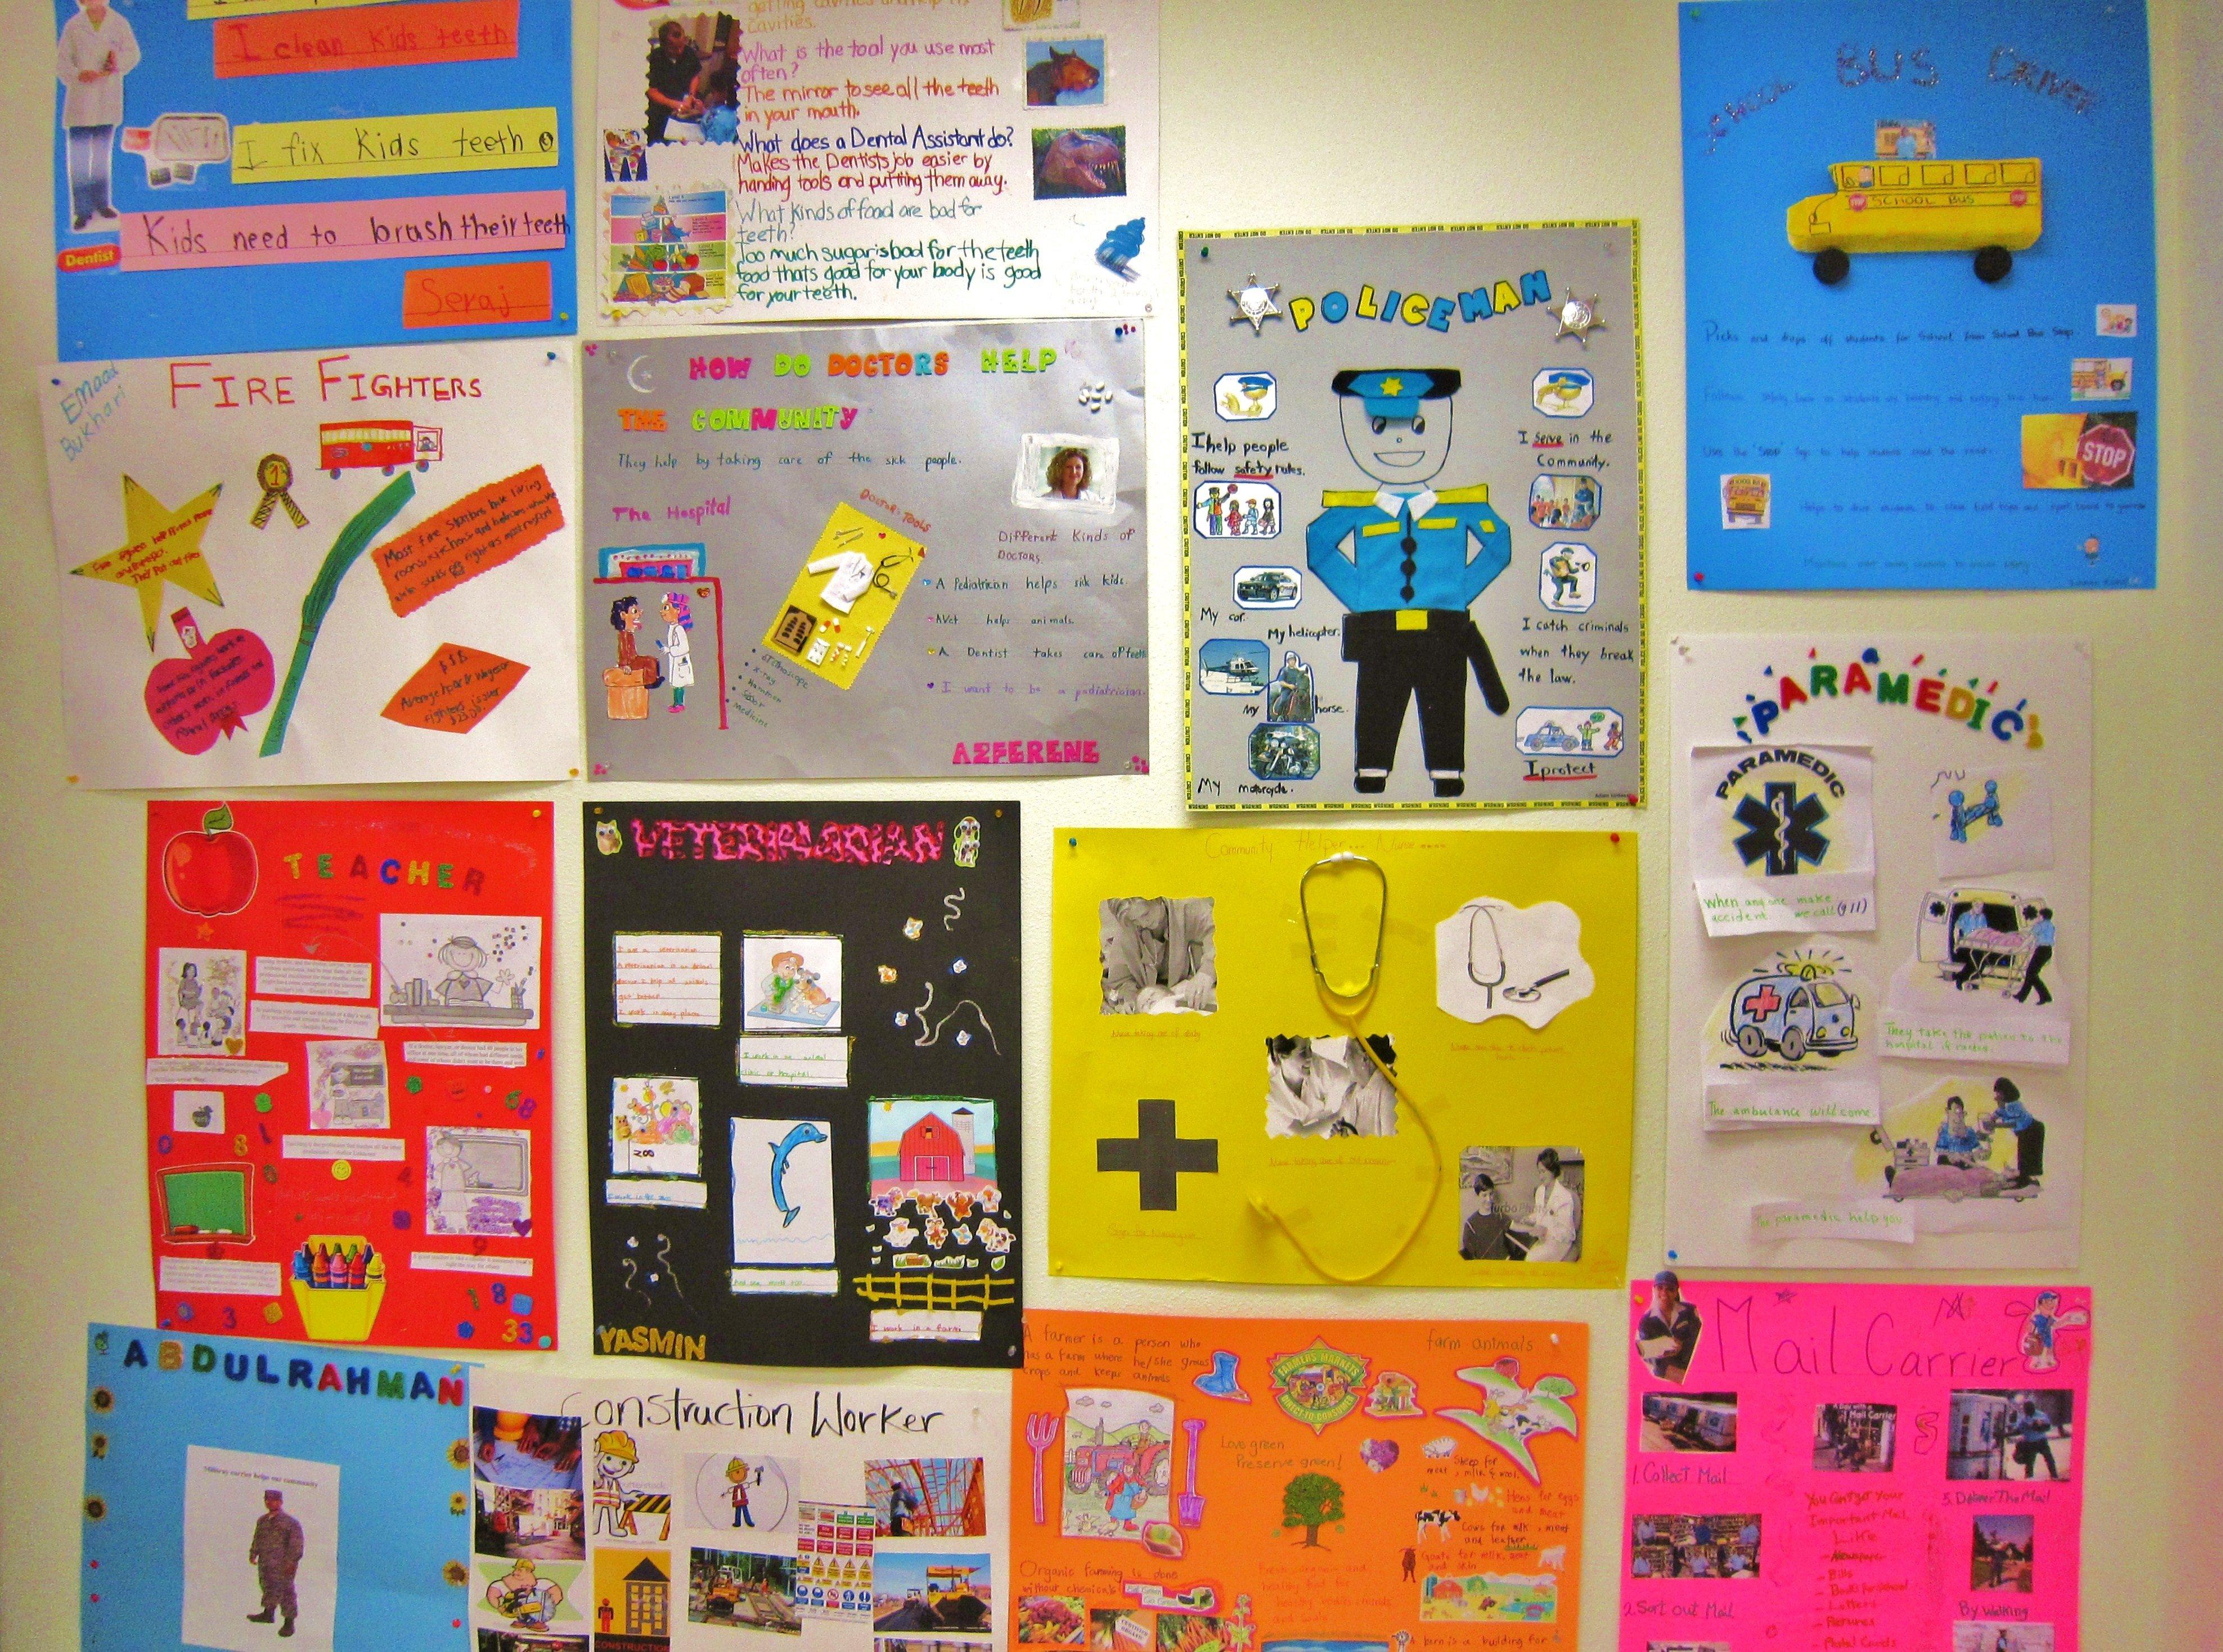 10 Stunning Creative Presentation Ideas For School 27 great creative school project presentation 2021